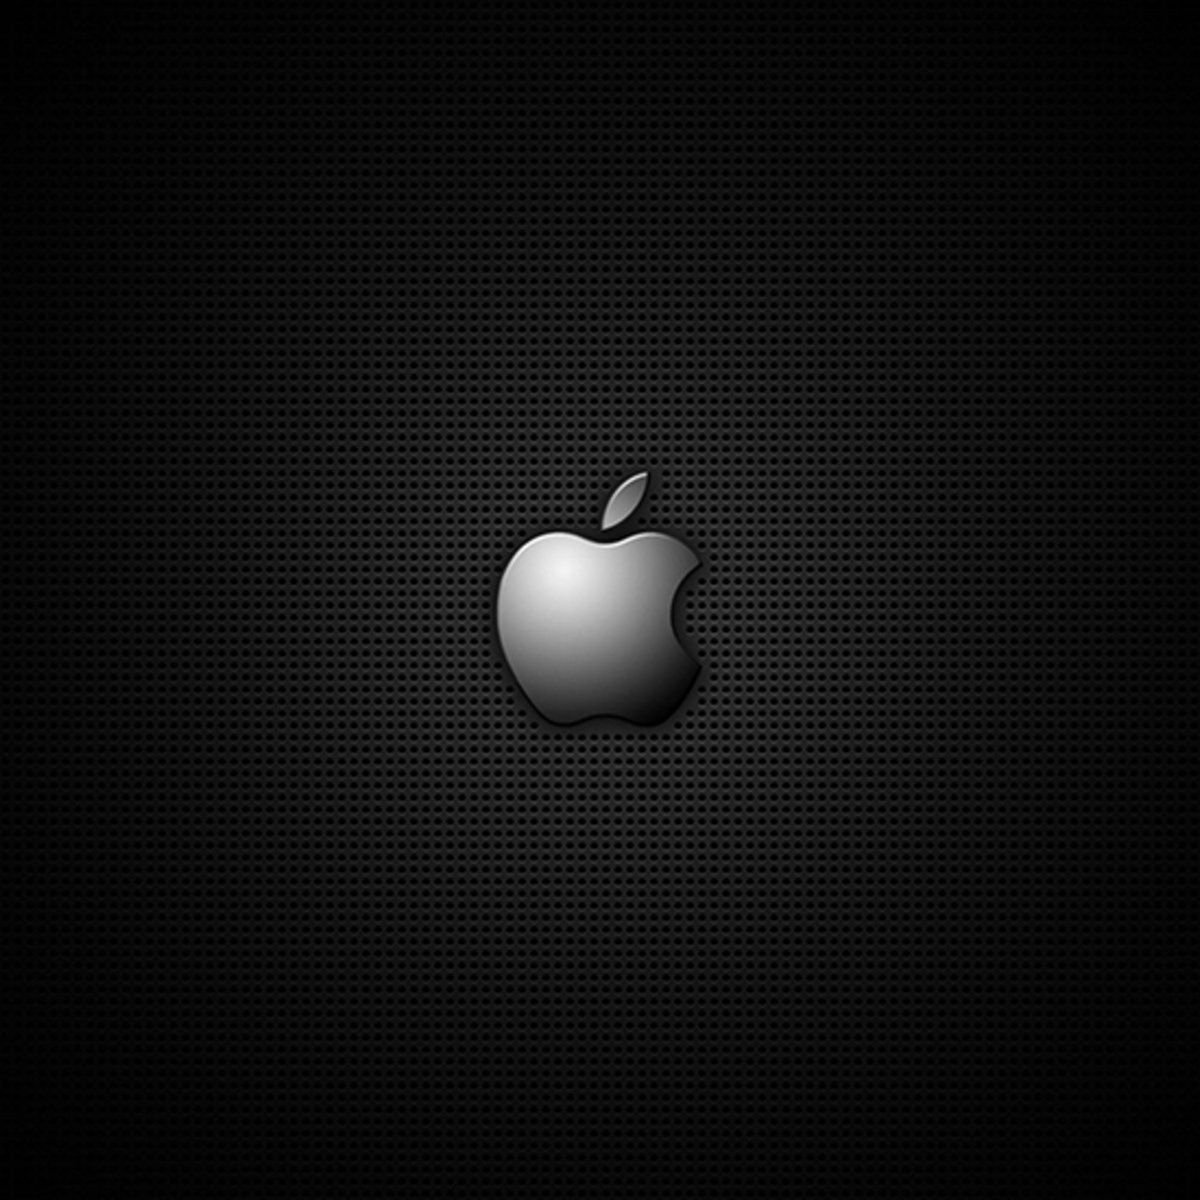 mejores-fondos-pantalla-ipad-9